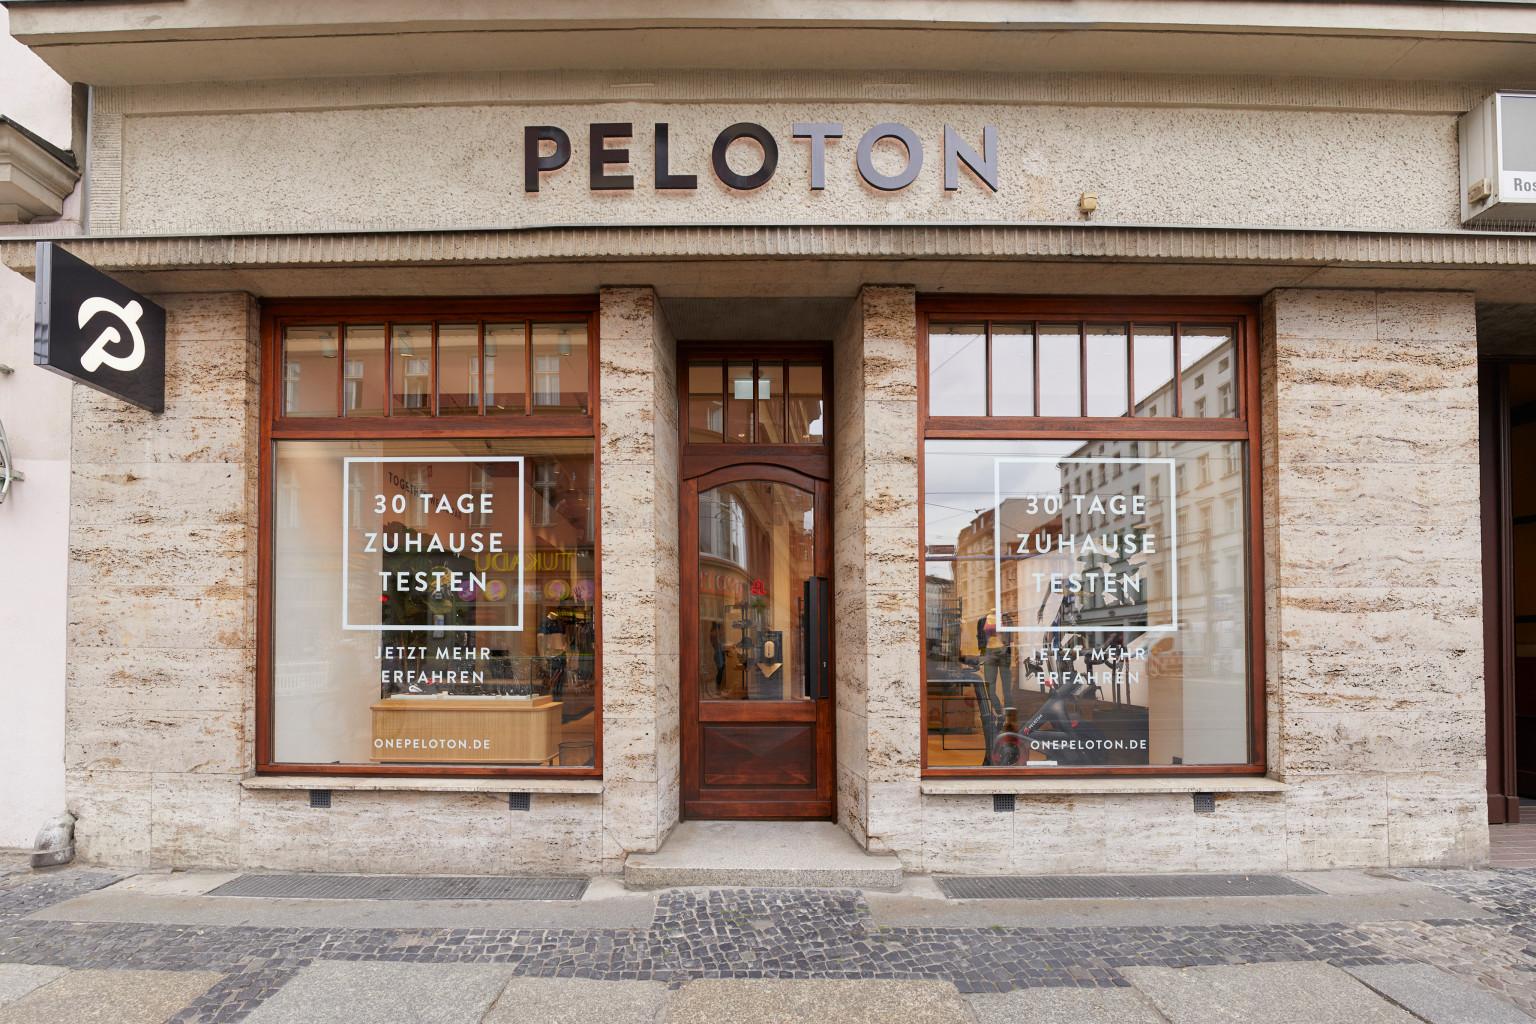 Let's cycle: In Berlin eröffnet endlich der erste Peloton Store